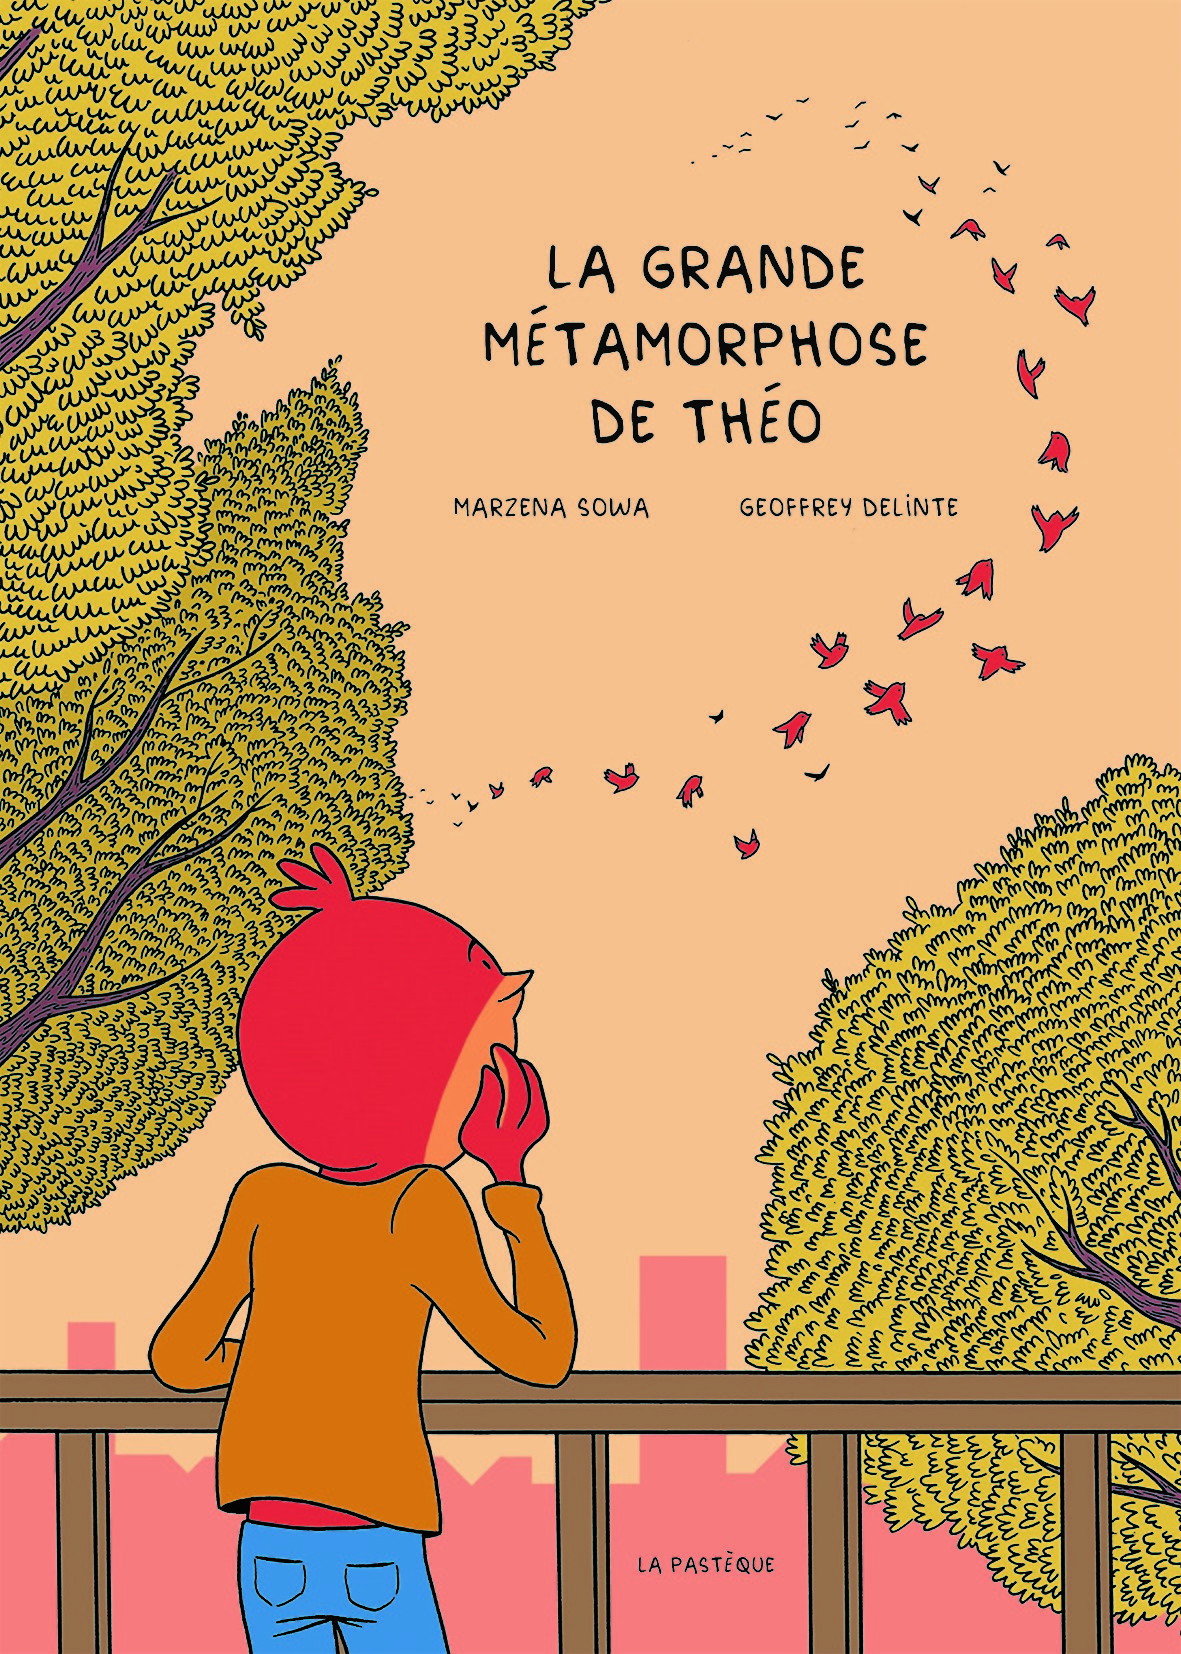 LA GRANDE METAMORPHOSE DE THEO